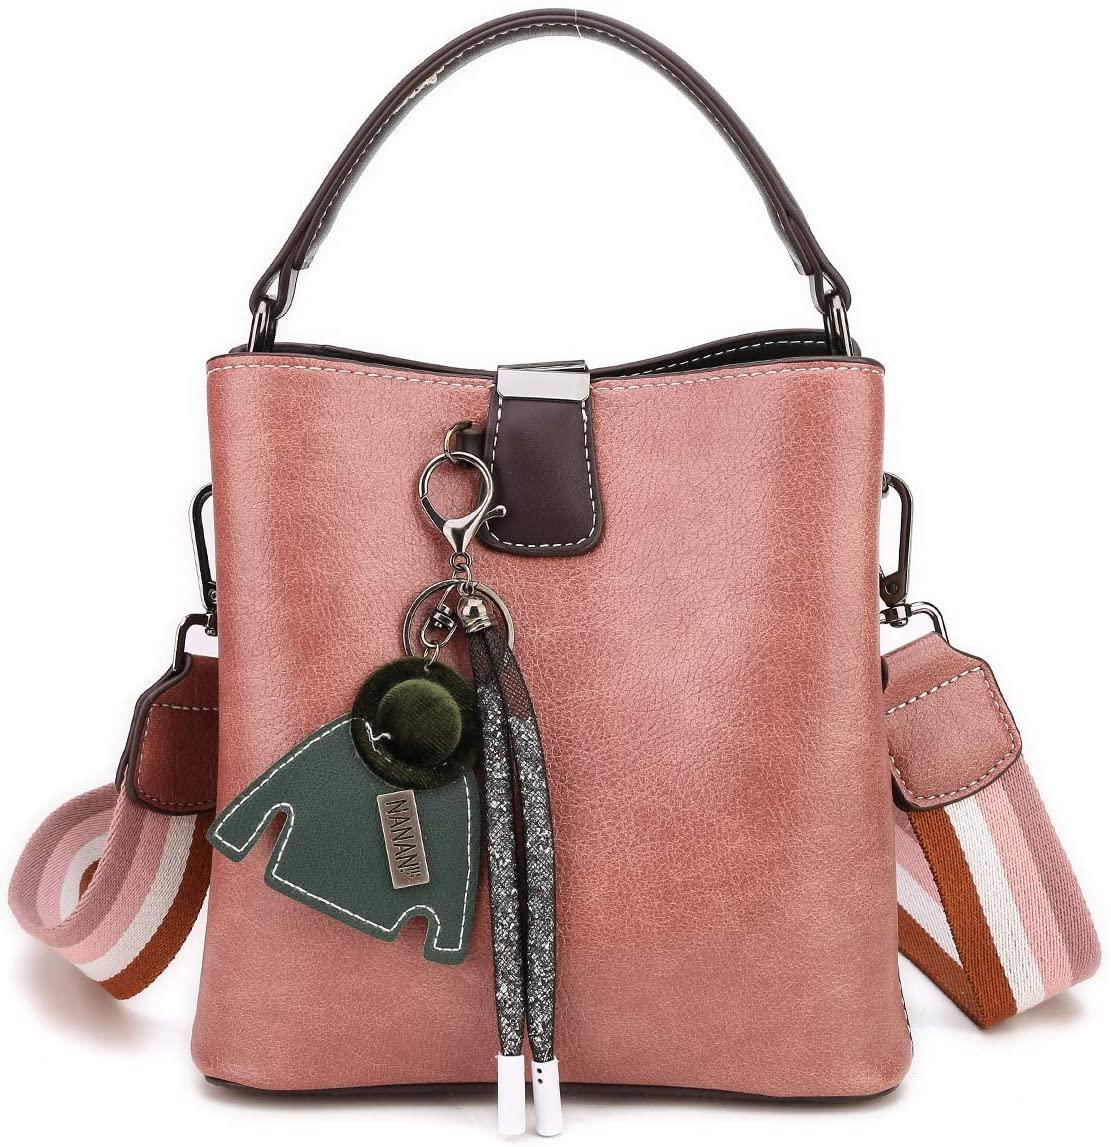 Crossbody Small Bucket Bag For Women Girls, Double Strap PU Leather Purse Vintage Shoulder Bag Handbag(Pink)